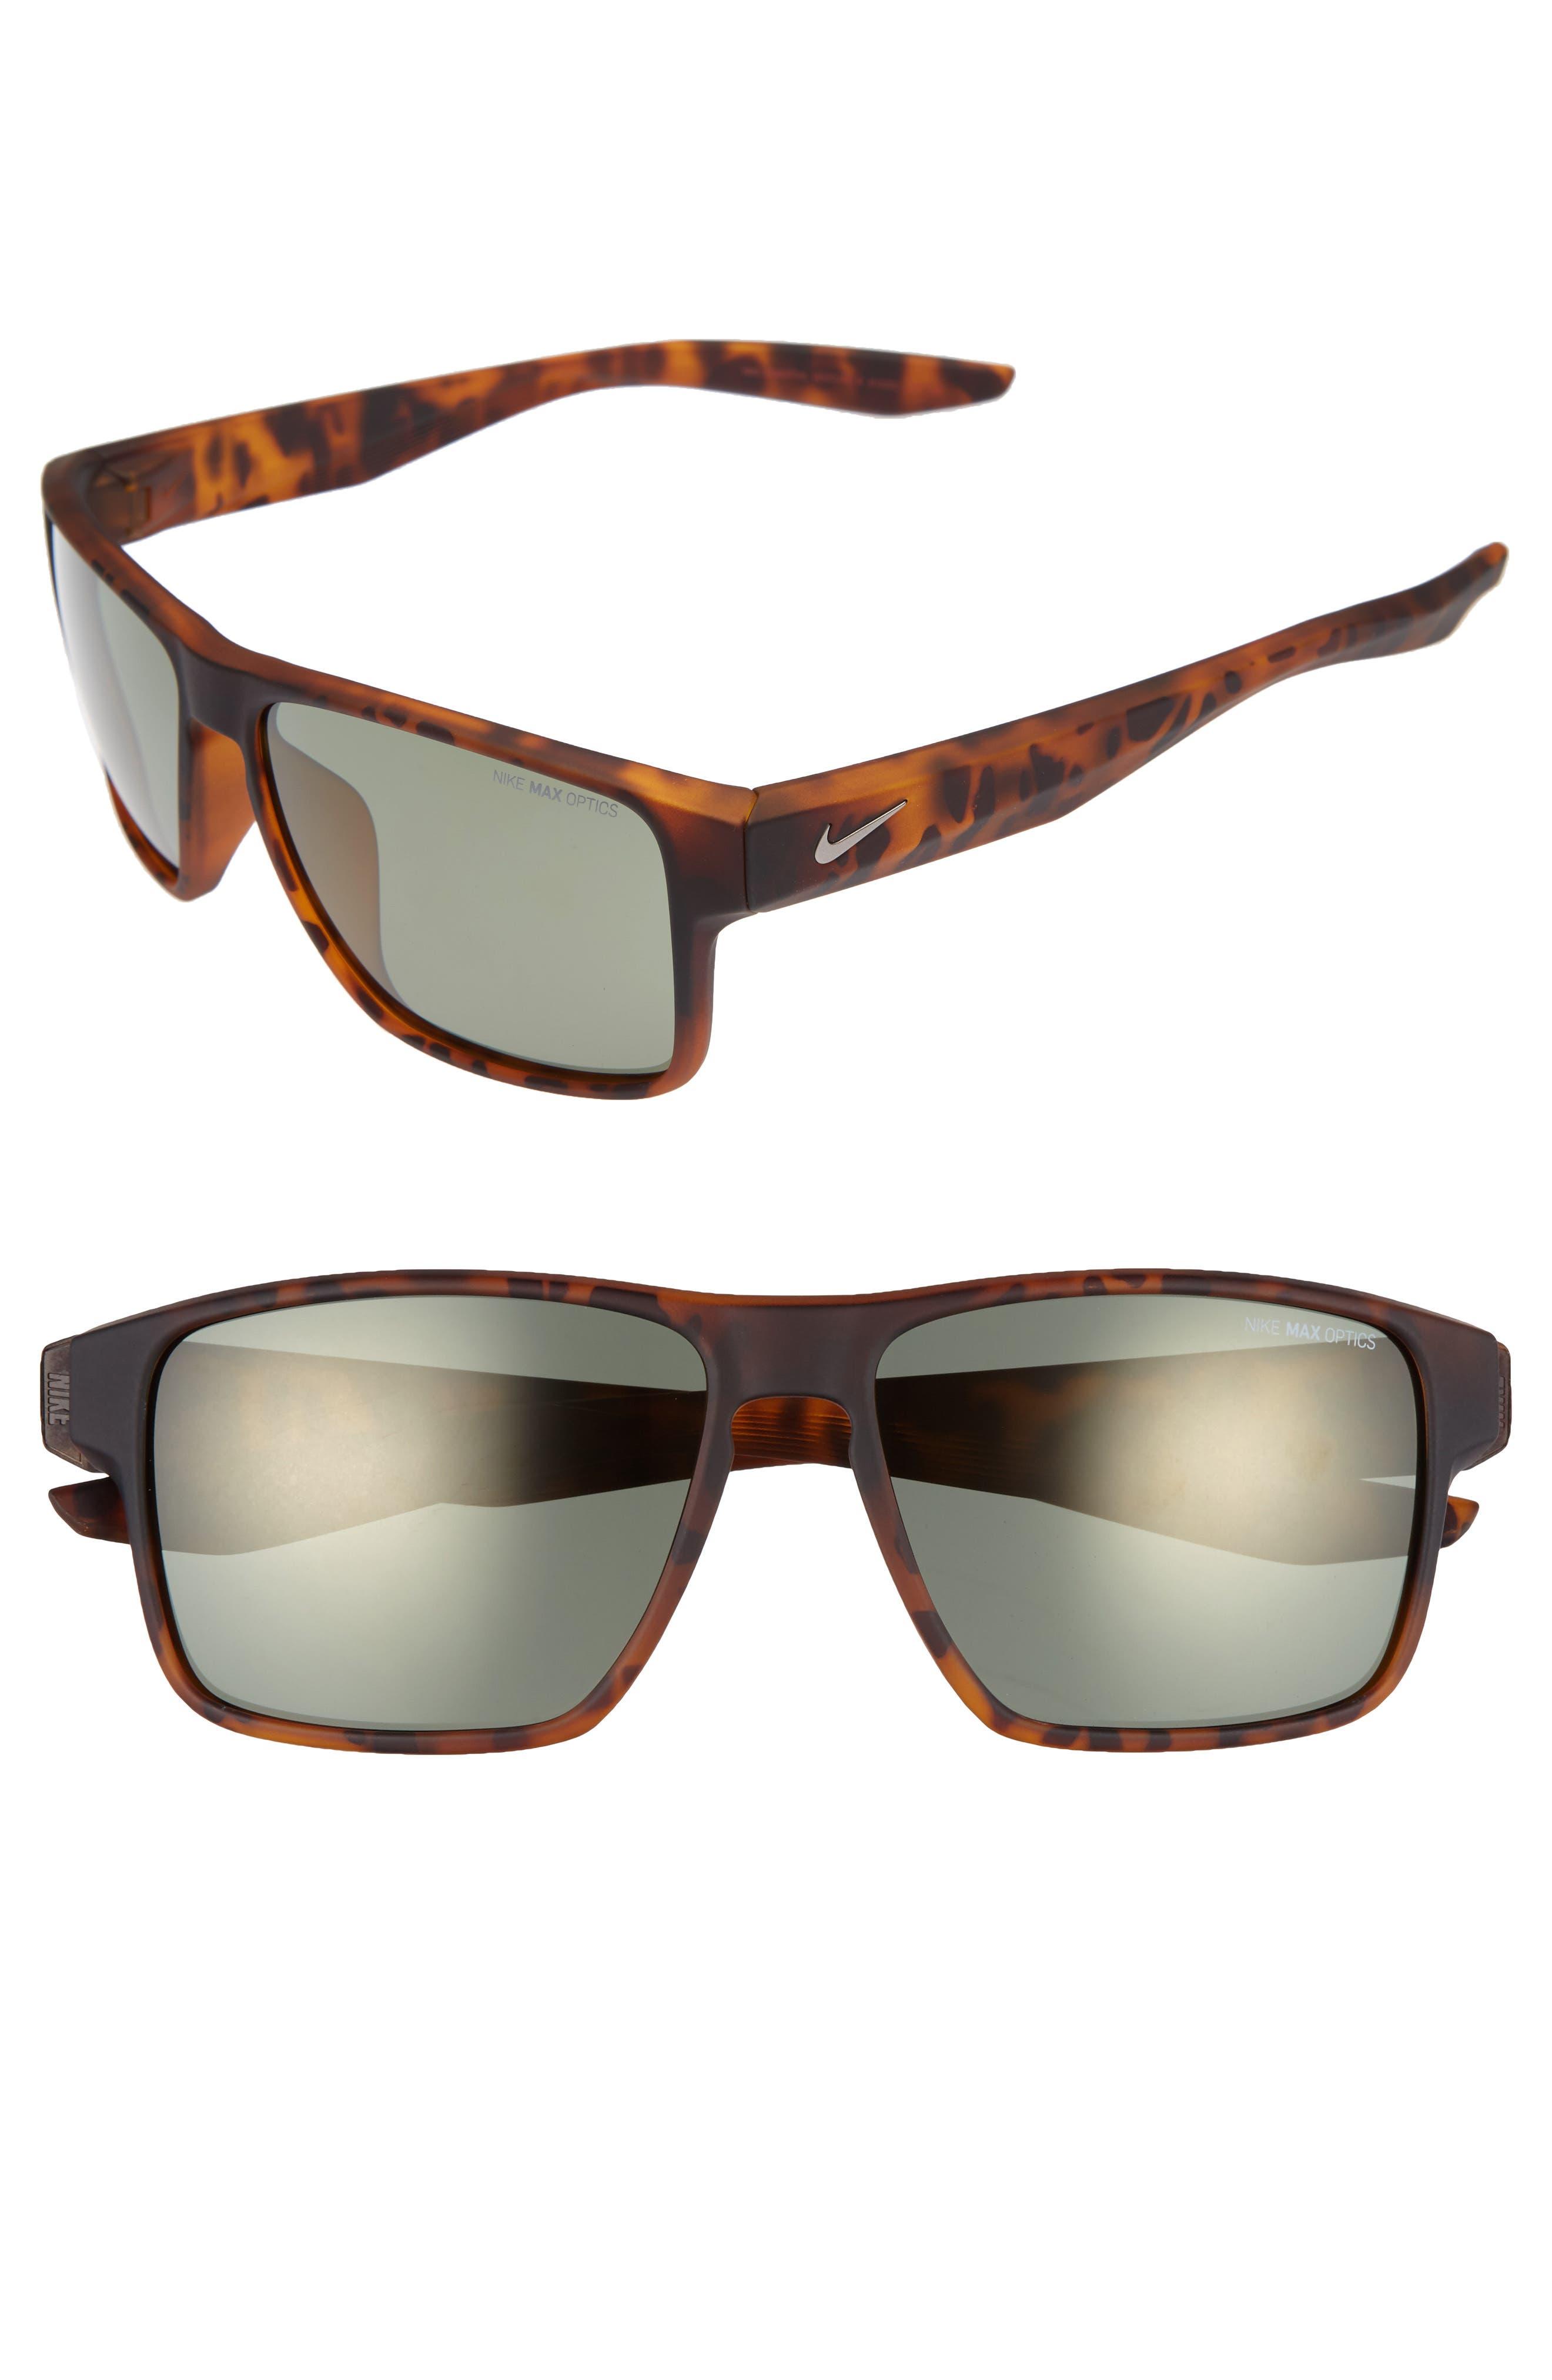 Nike Essential Venture R 5m Sunglasses - Matte Tortoise